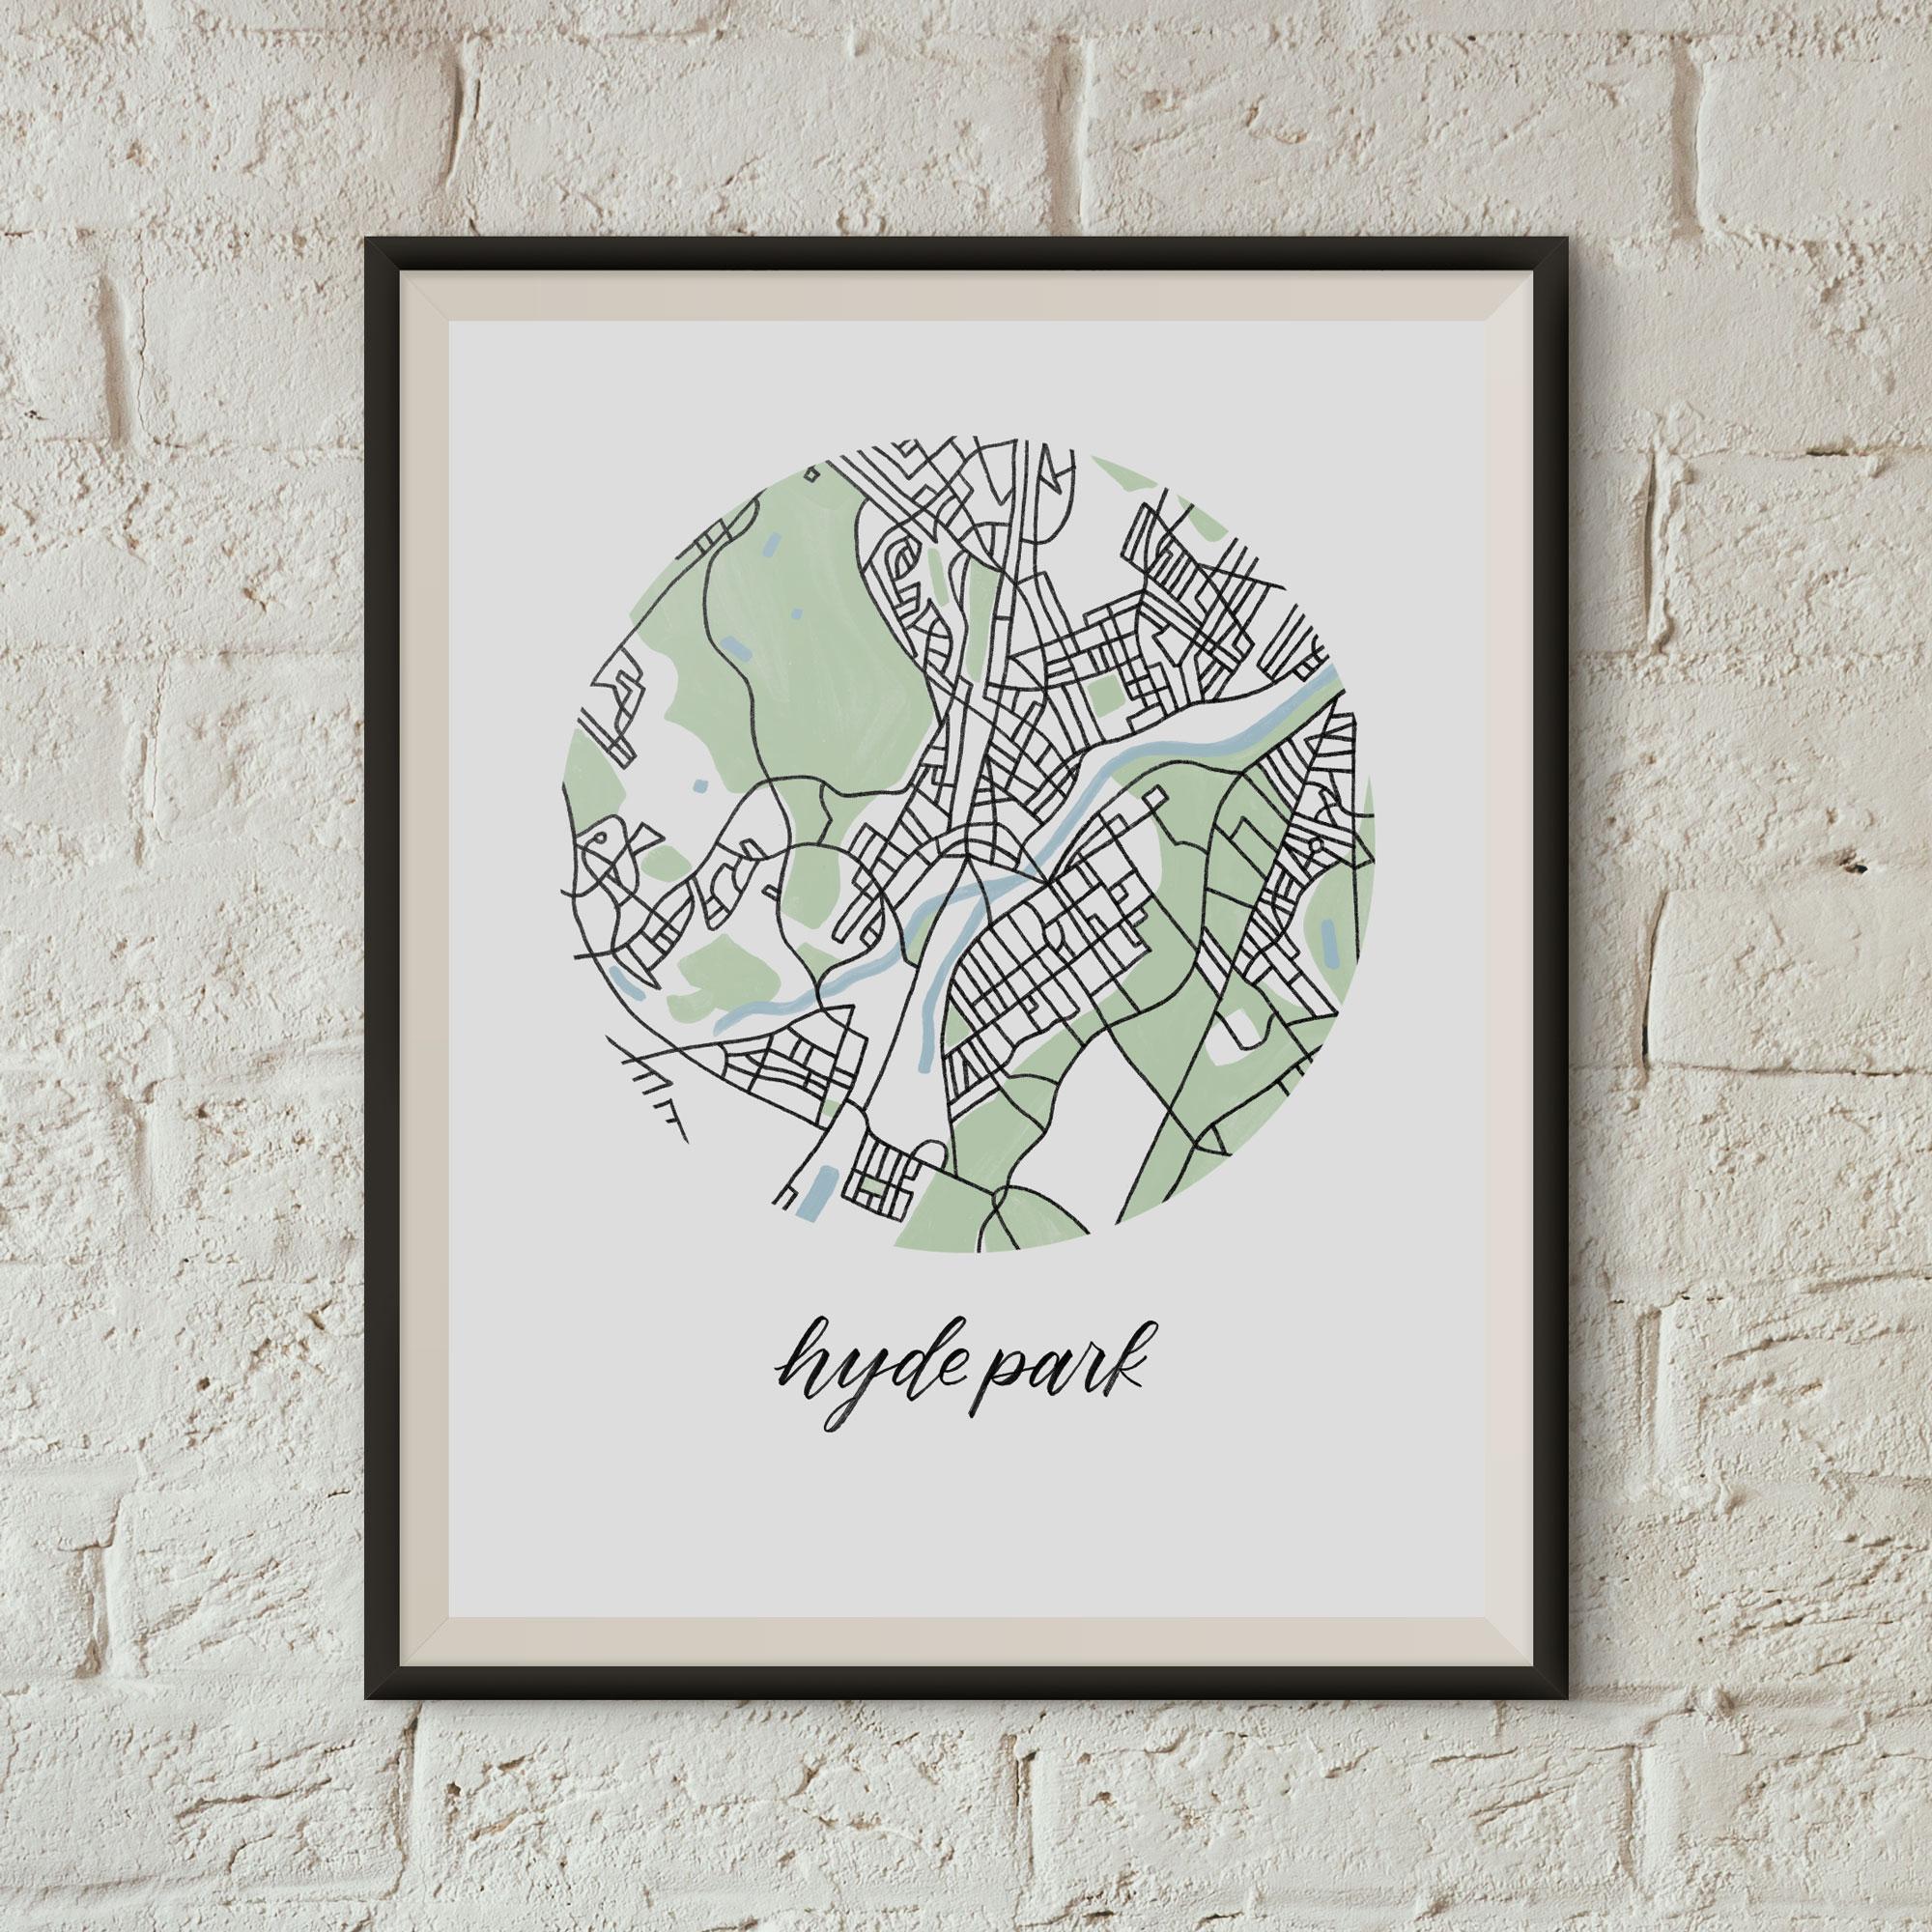 Hyde Park, Boston Map Print framed on a white brick wall